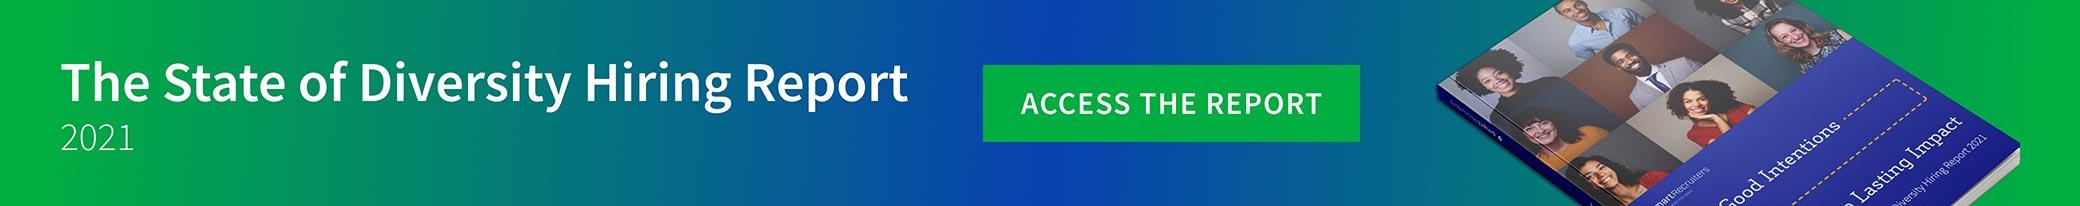 Access the Diversity Hiring Report 2021